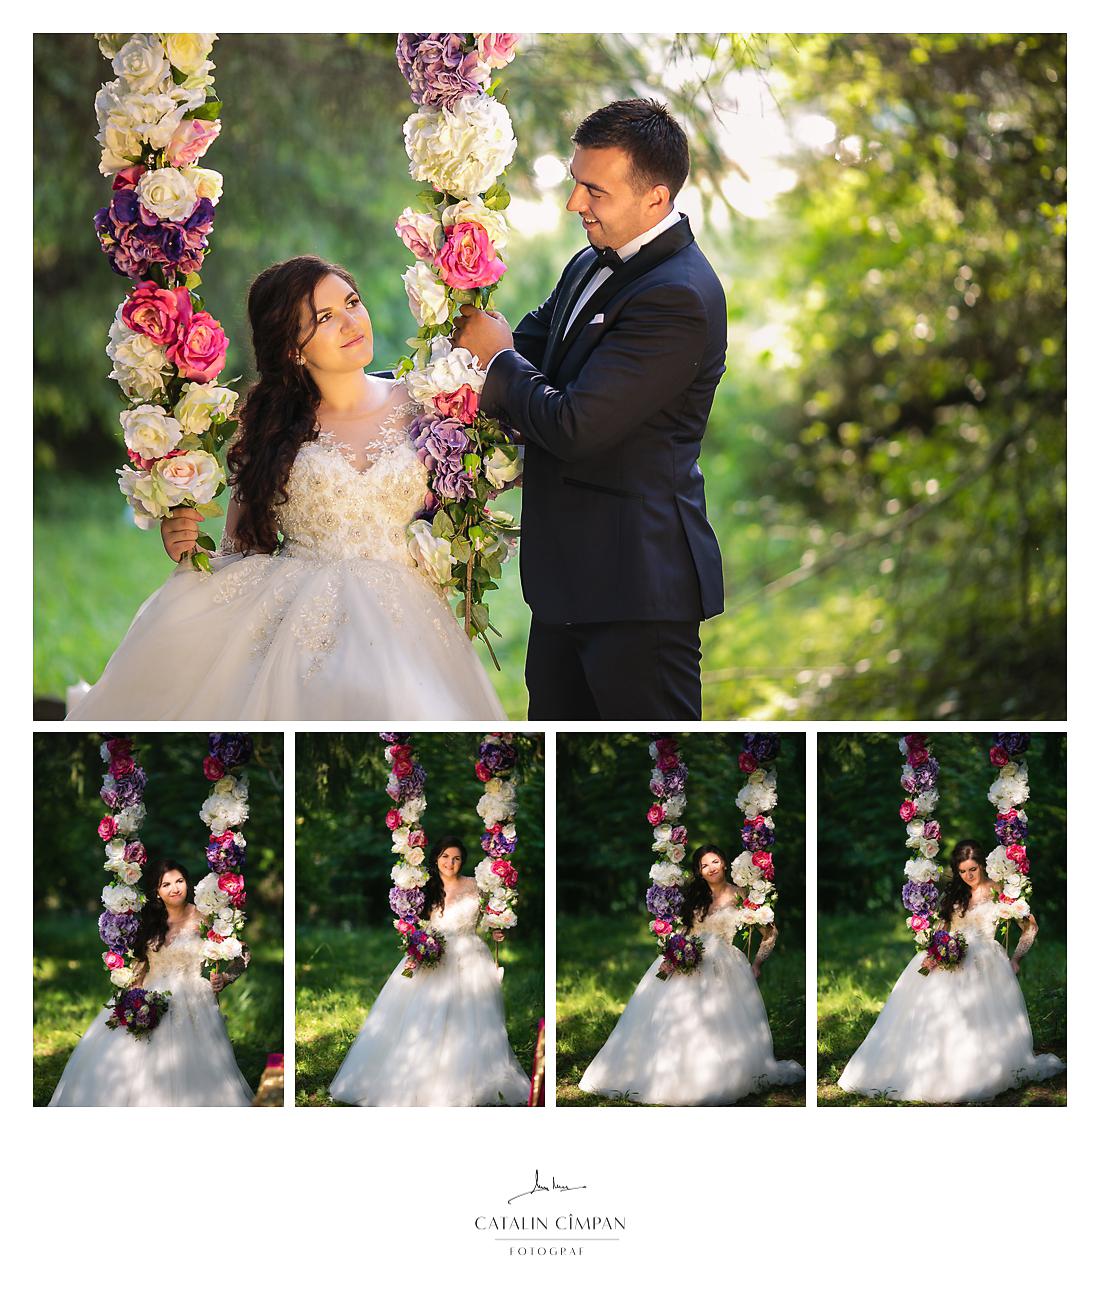 Florentina-Ionut-fotografii-nunta-17